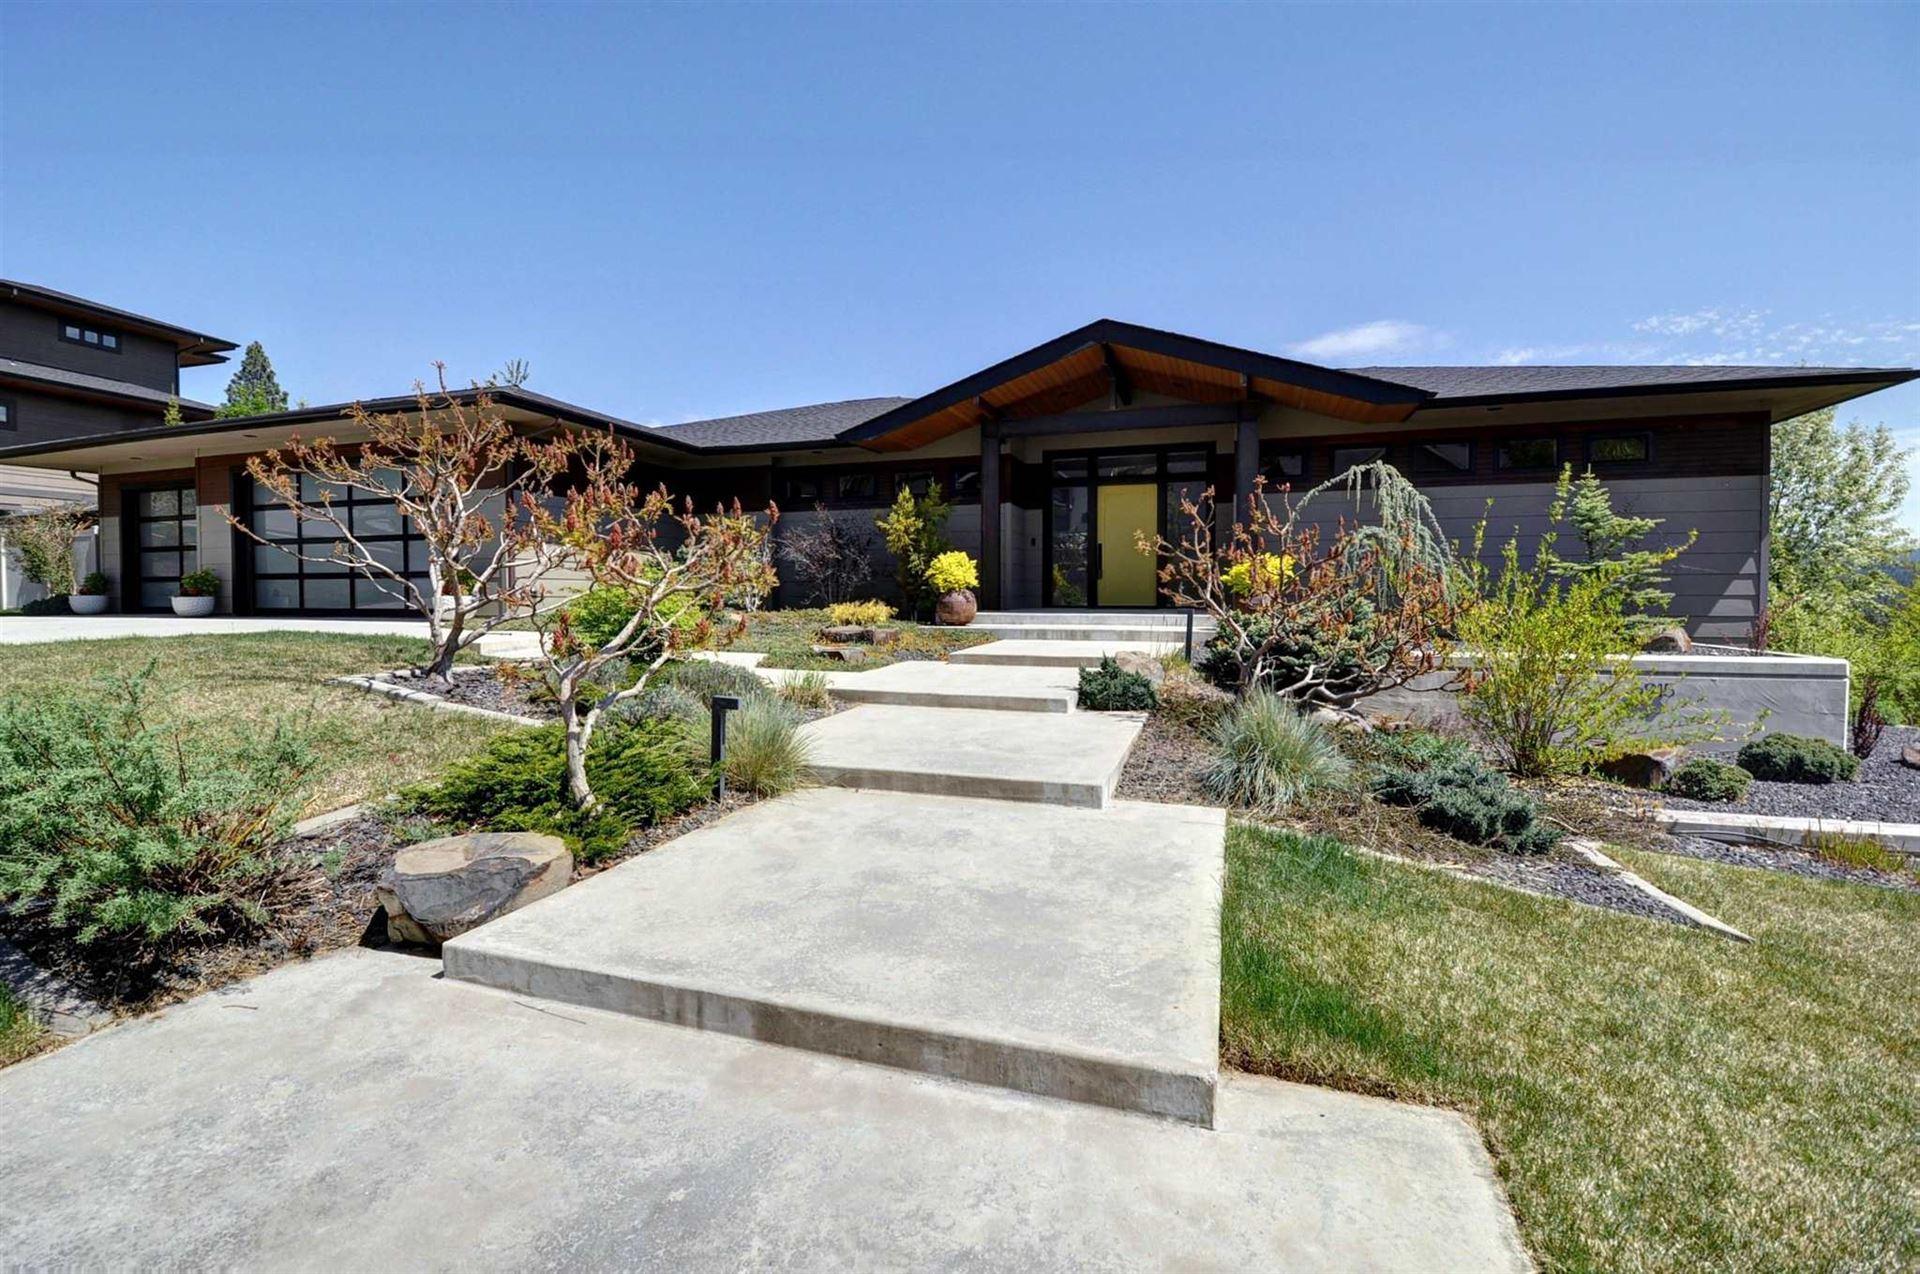 5915 S Summerwood St, Spokane, WA 99224 - #: 202115081